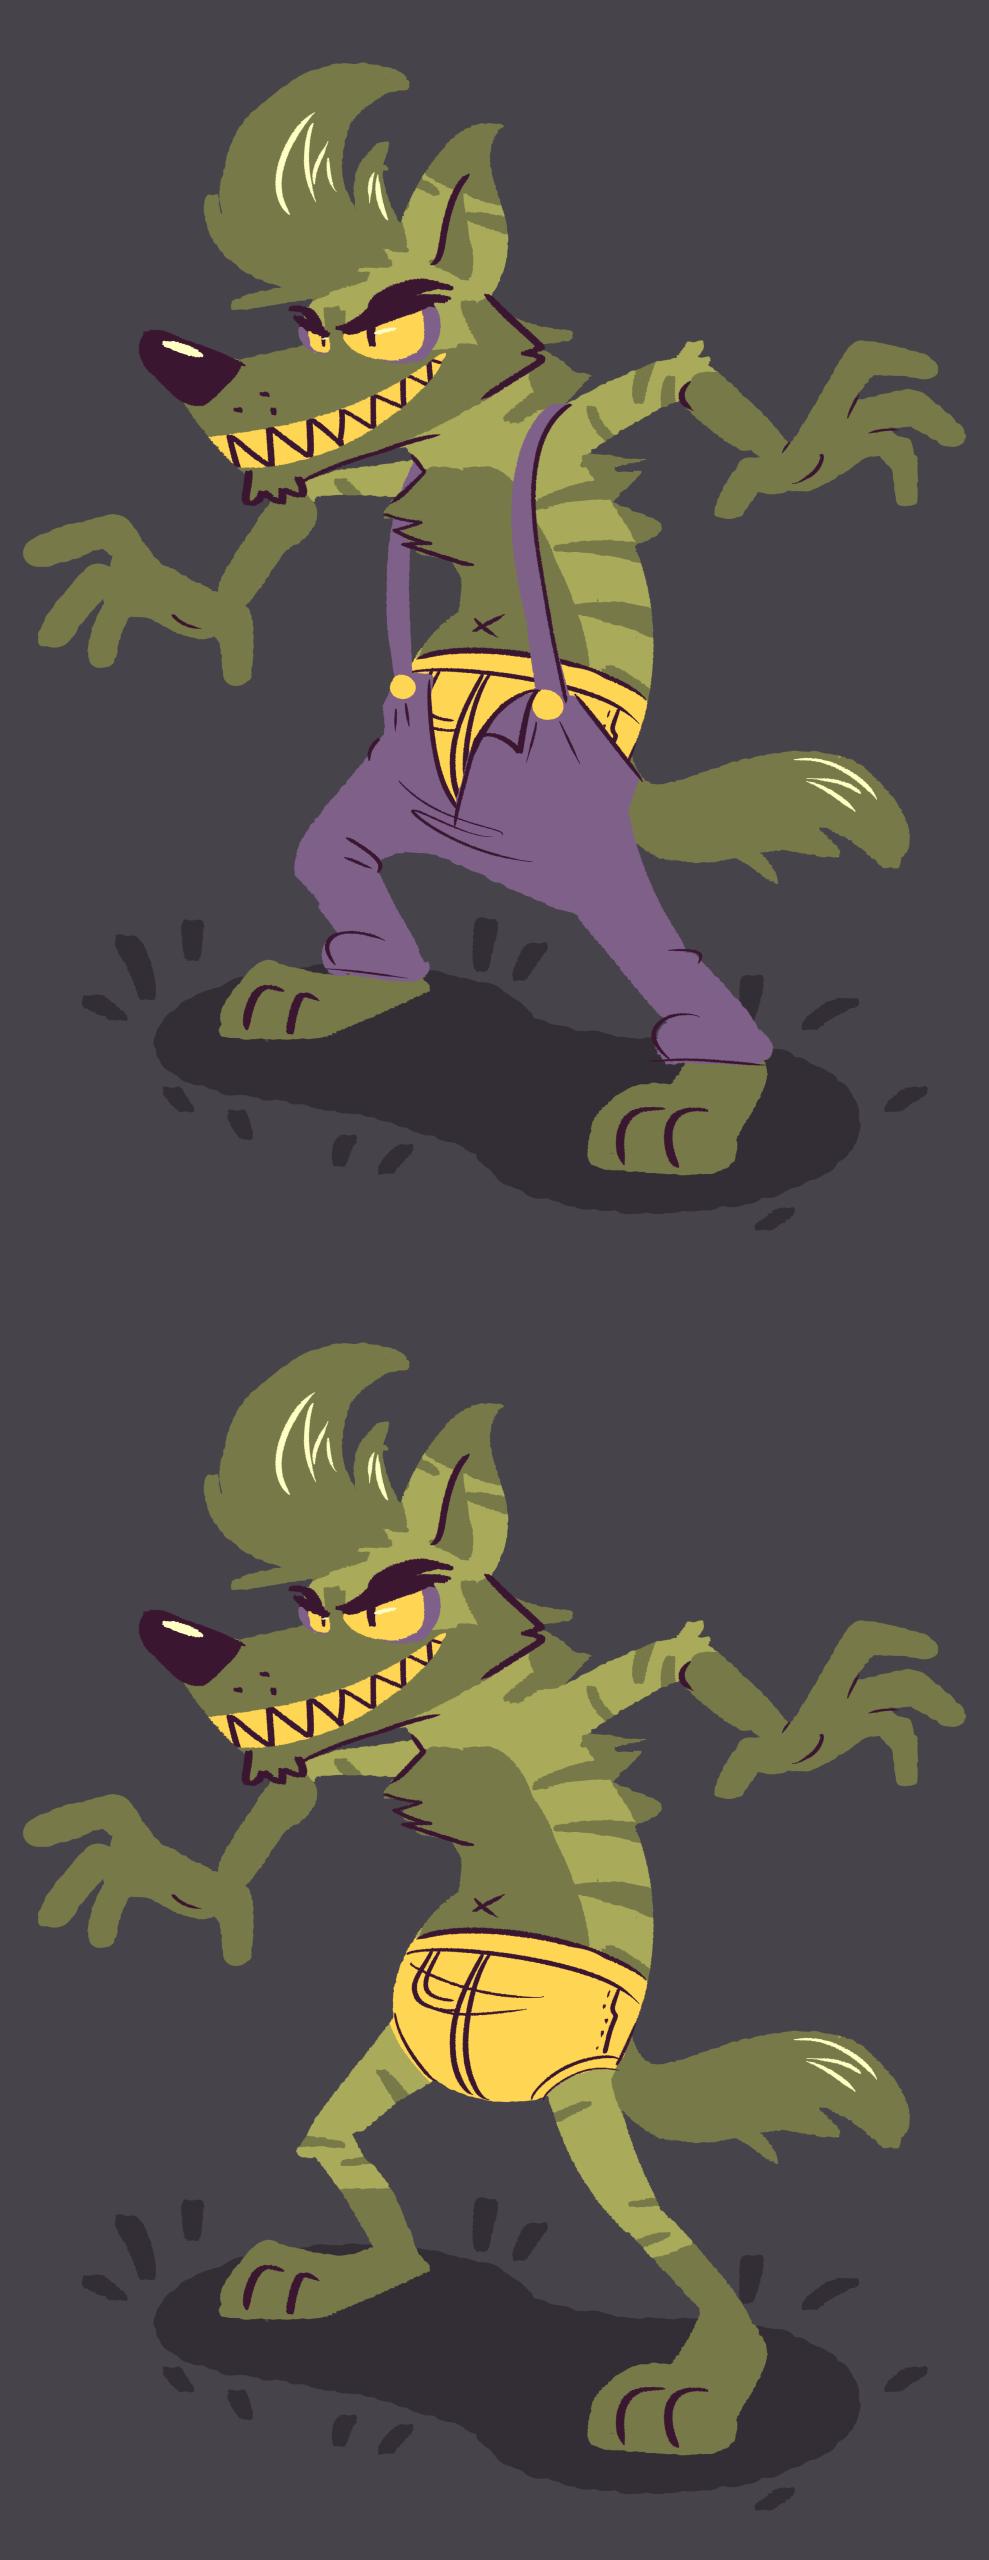 Mean green yeen